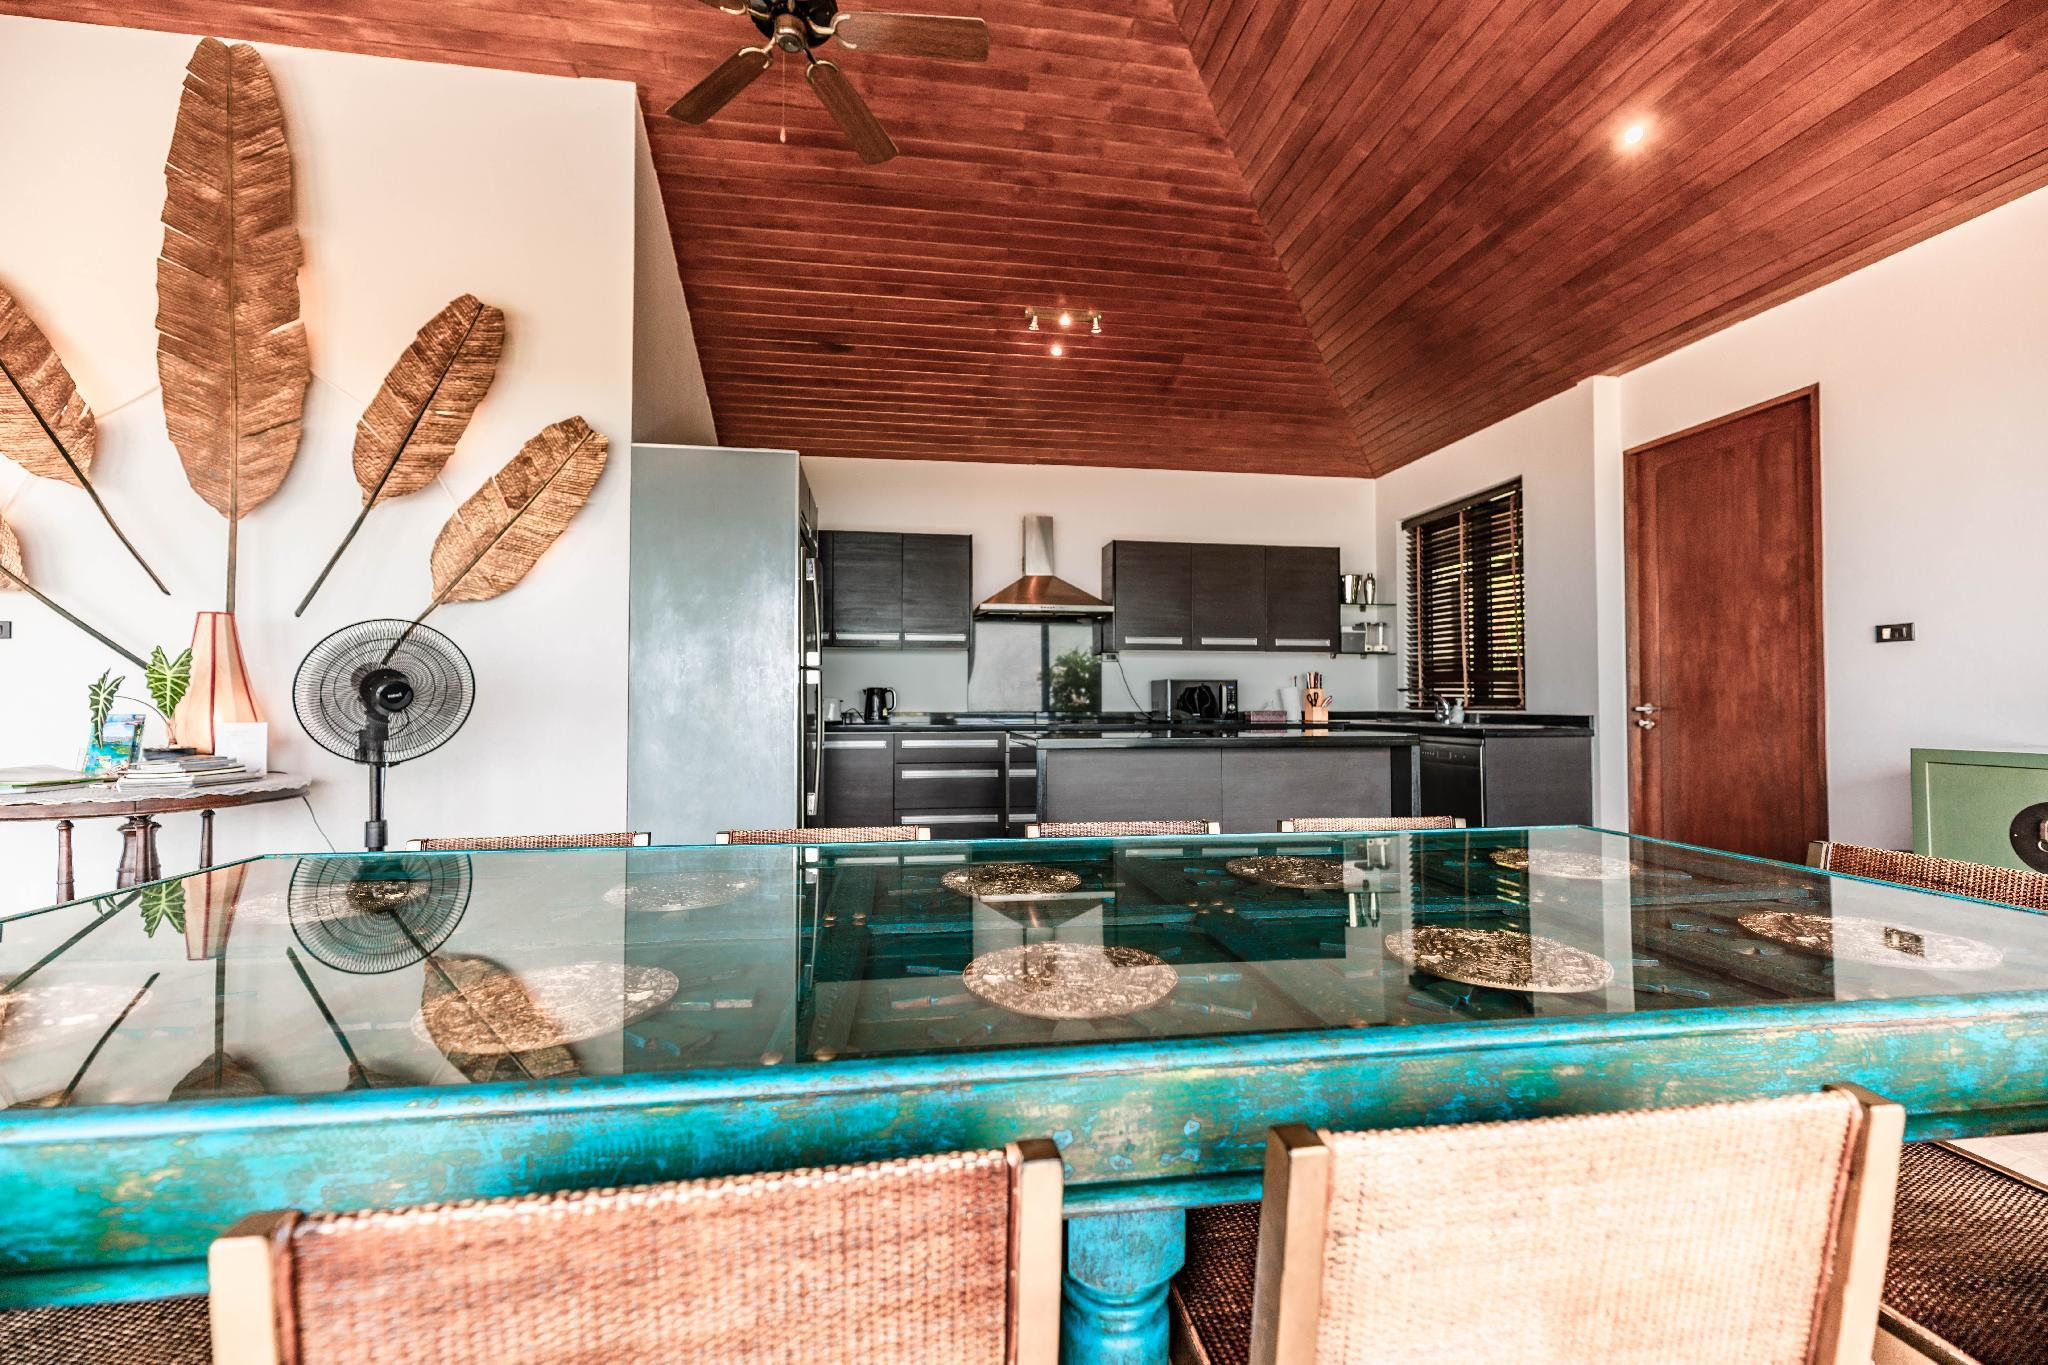 Baan Ling Noi 4 bedroom sea view villa วิลลา 4 ห้องนอน 4 ห้องน้ำส่วนตัว ขนาด 600 ตร.ม. – หาดบ่อผุด